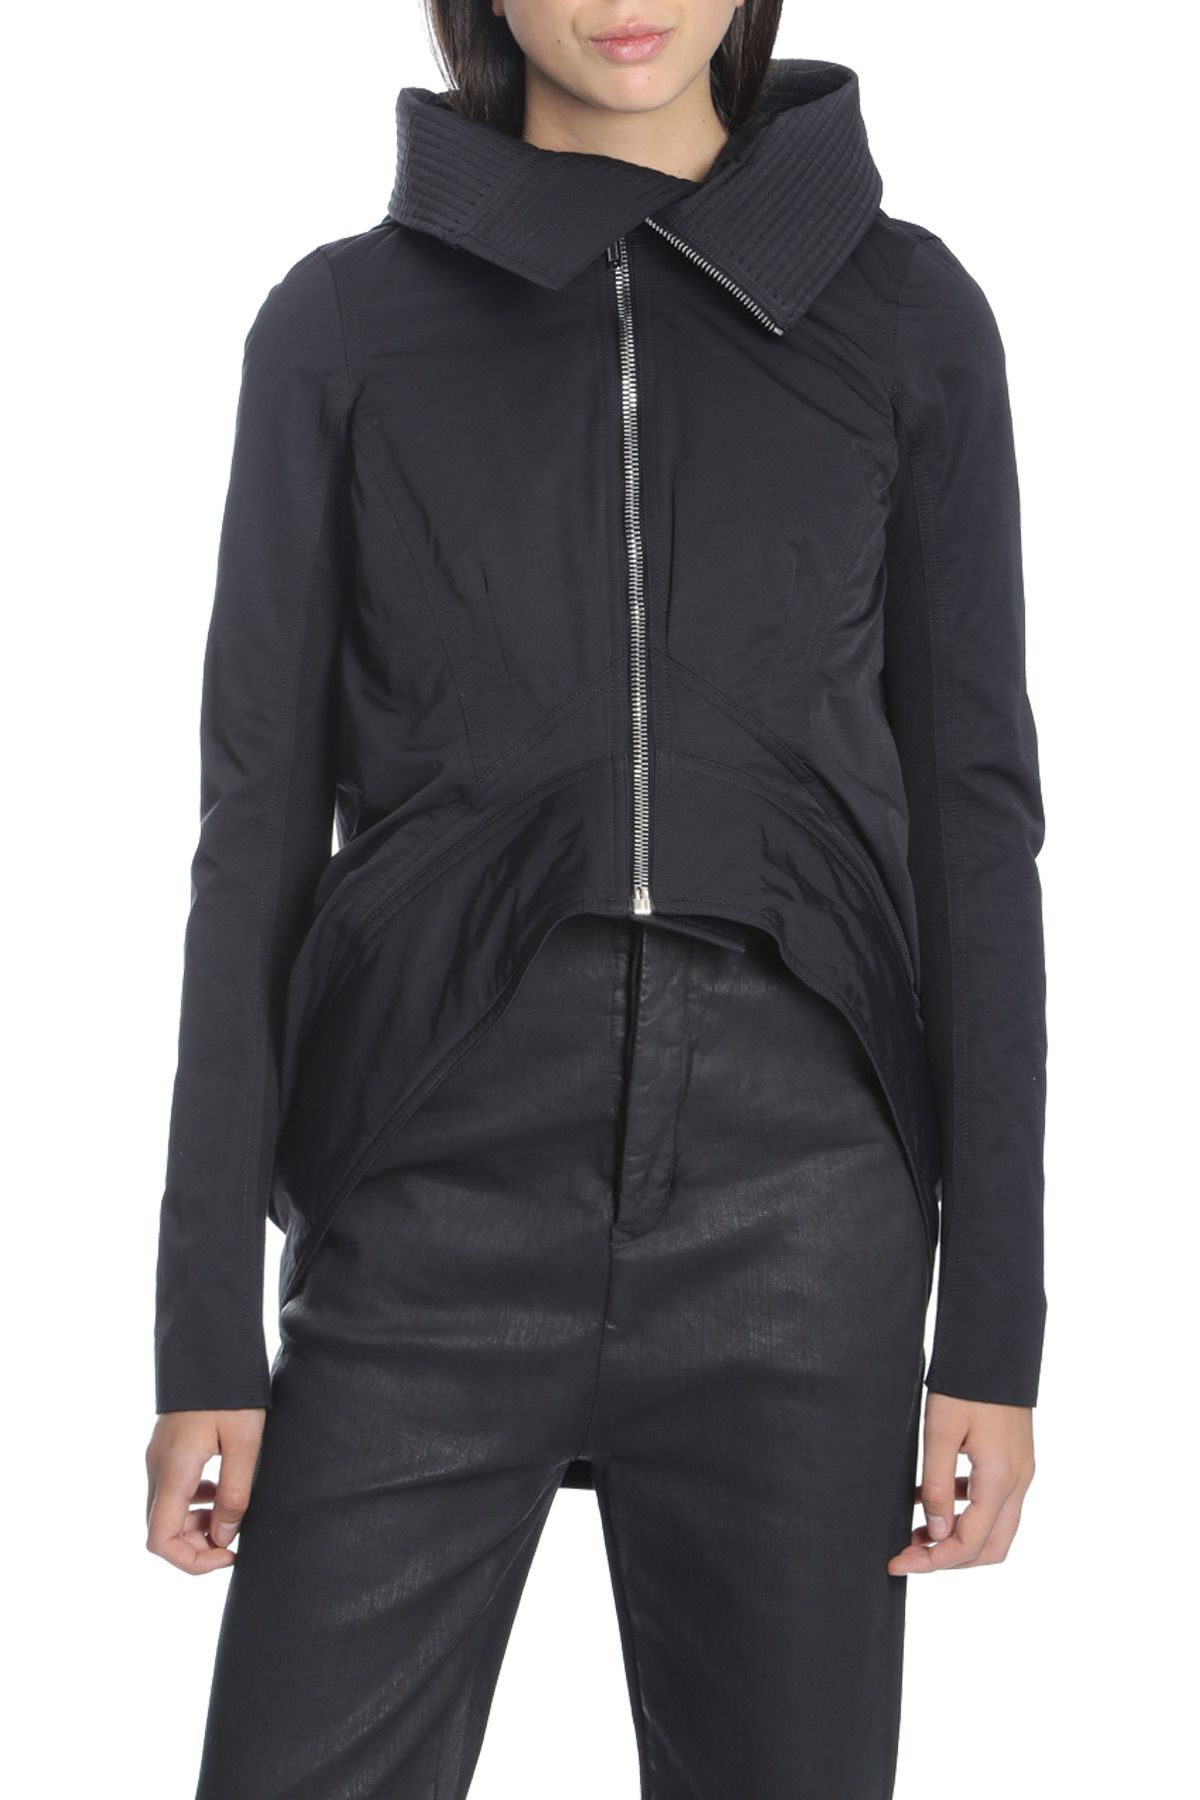 DRKSHDW Jacket in Nero